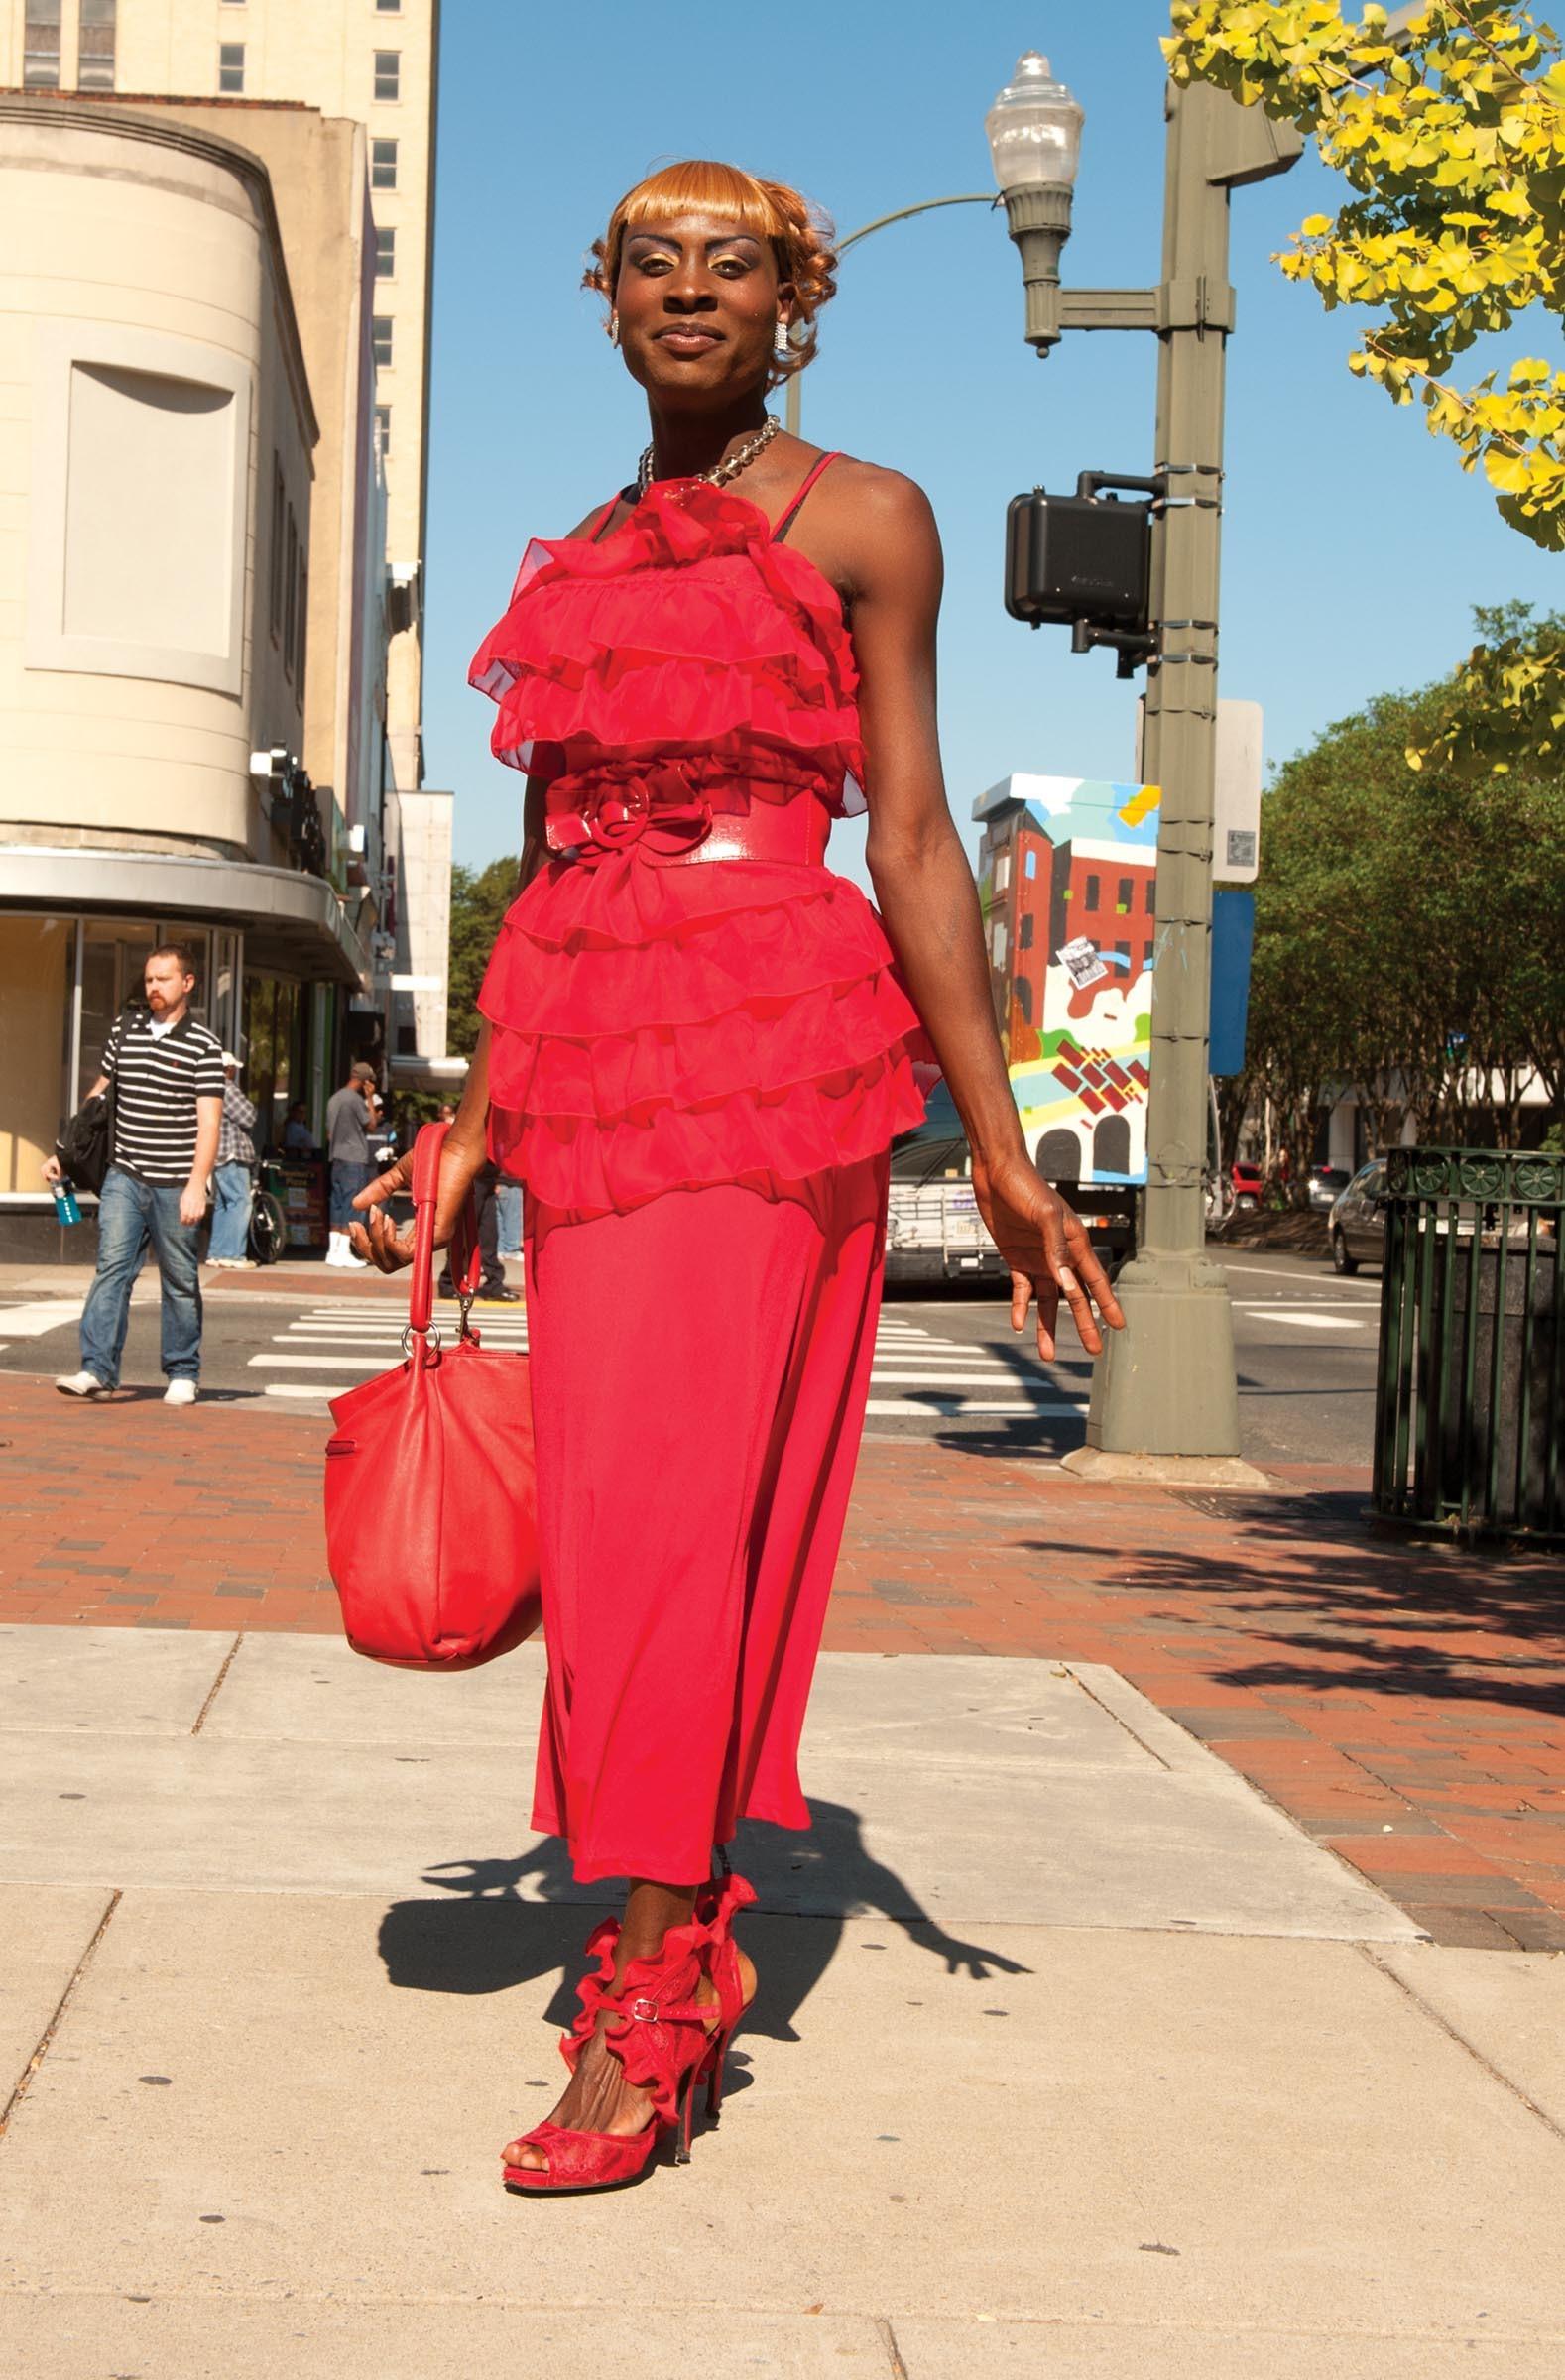 Jasmine poses on the corner of Fourth and Broad streets. - SCOTT ELMQUIST